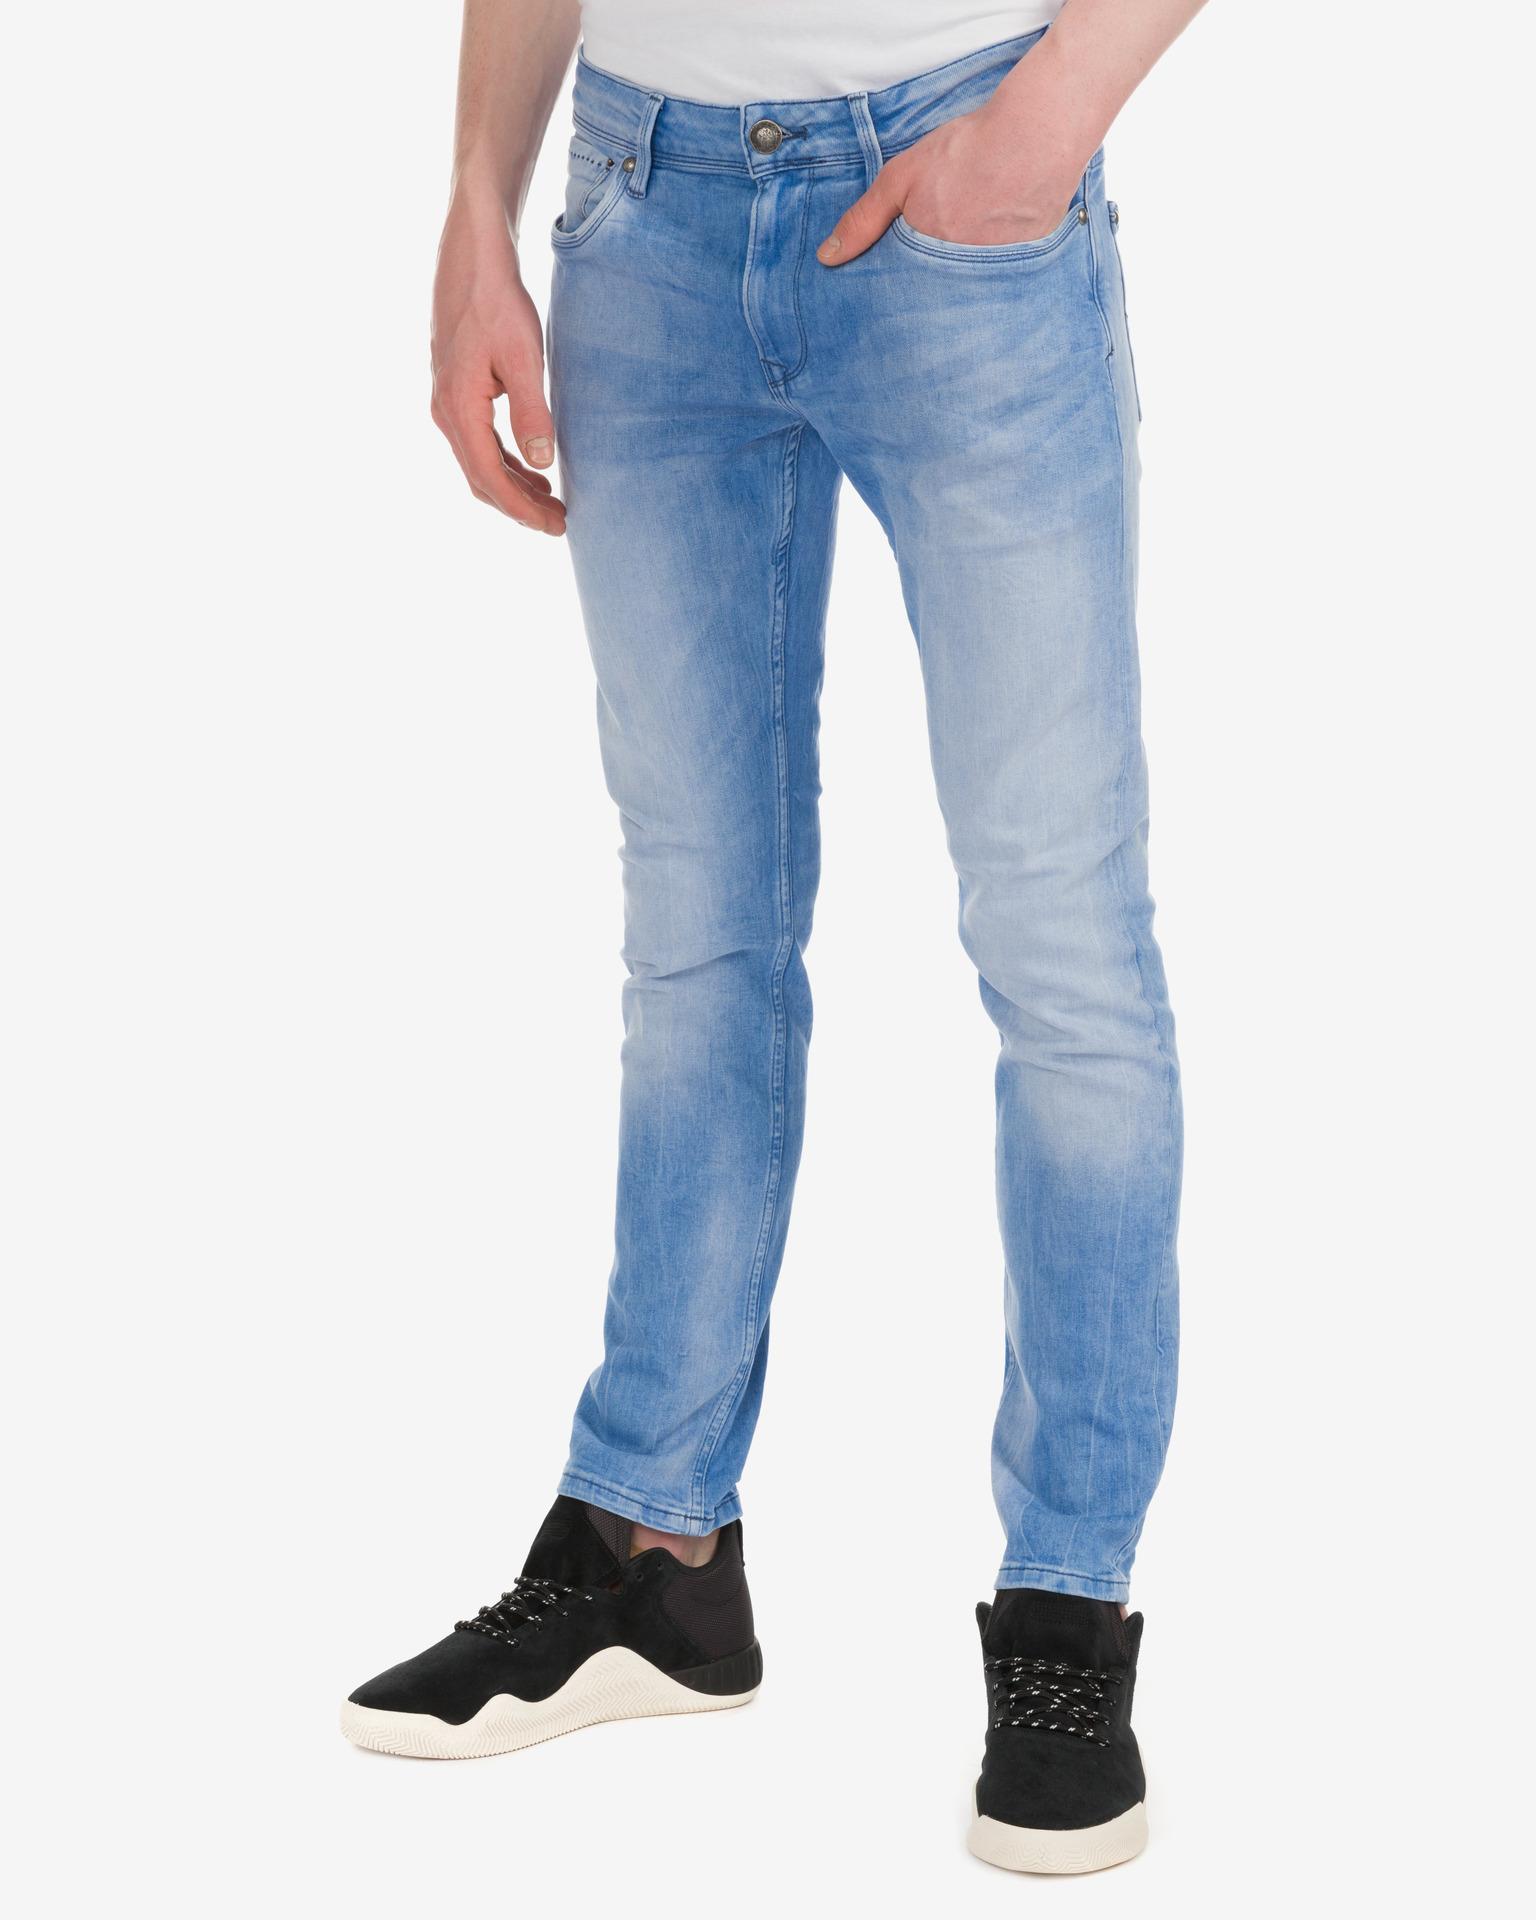 d38bf1419cc Pepe Jeans - Zinc Ice Jeans